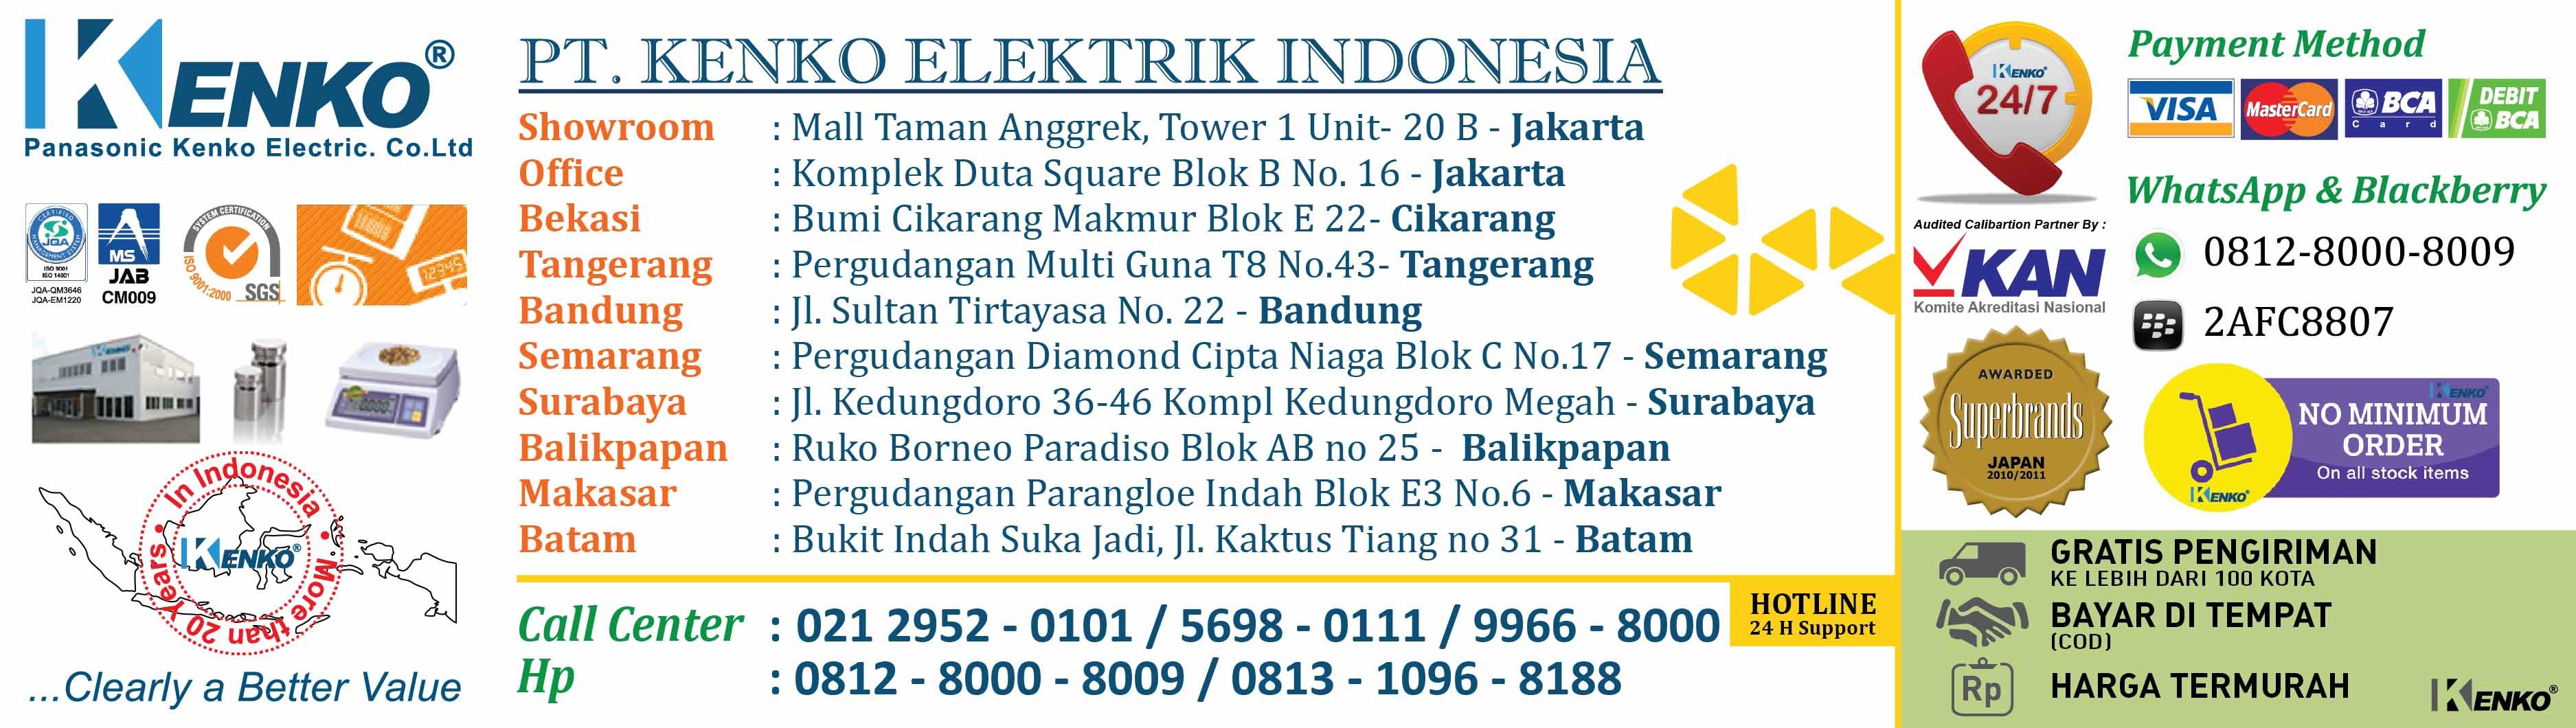 http://timbangan.co.id/images/header.png